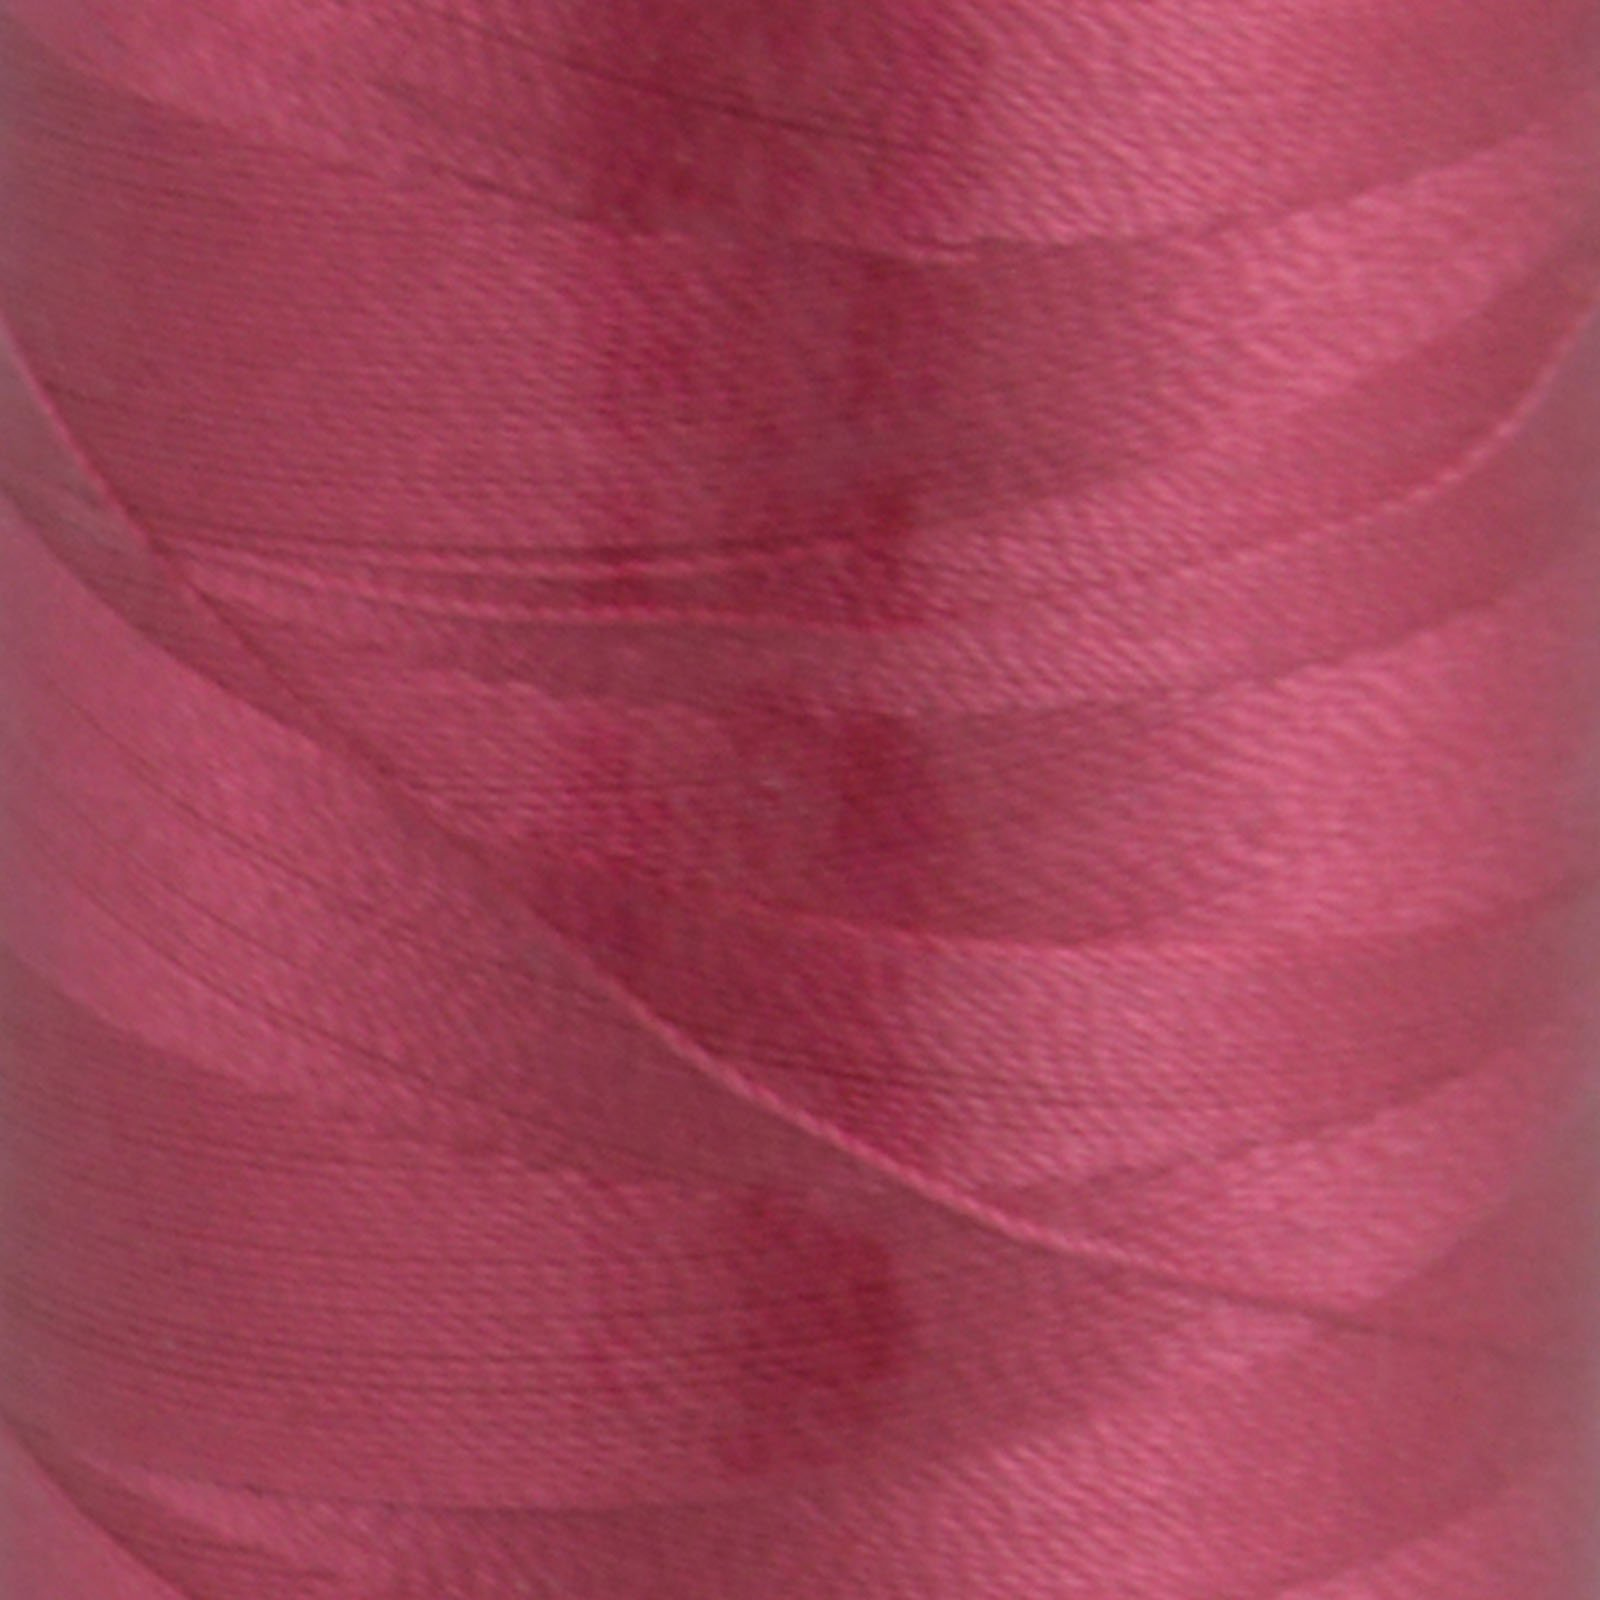 # 2530 Blossom Pink